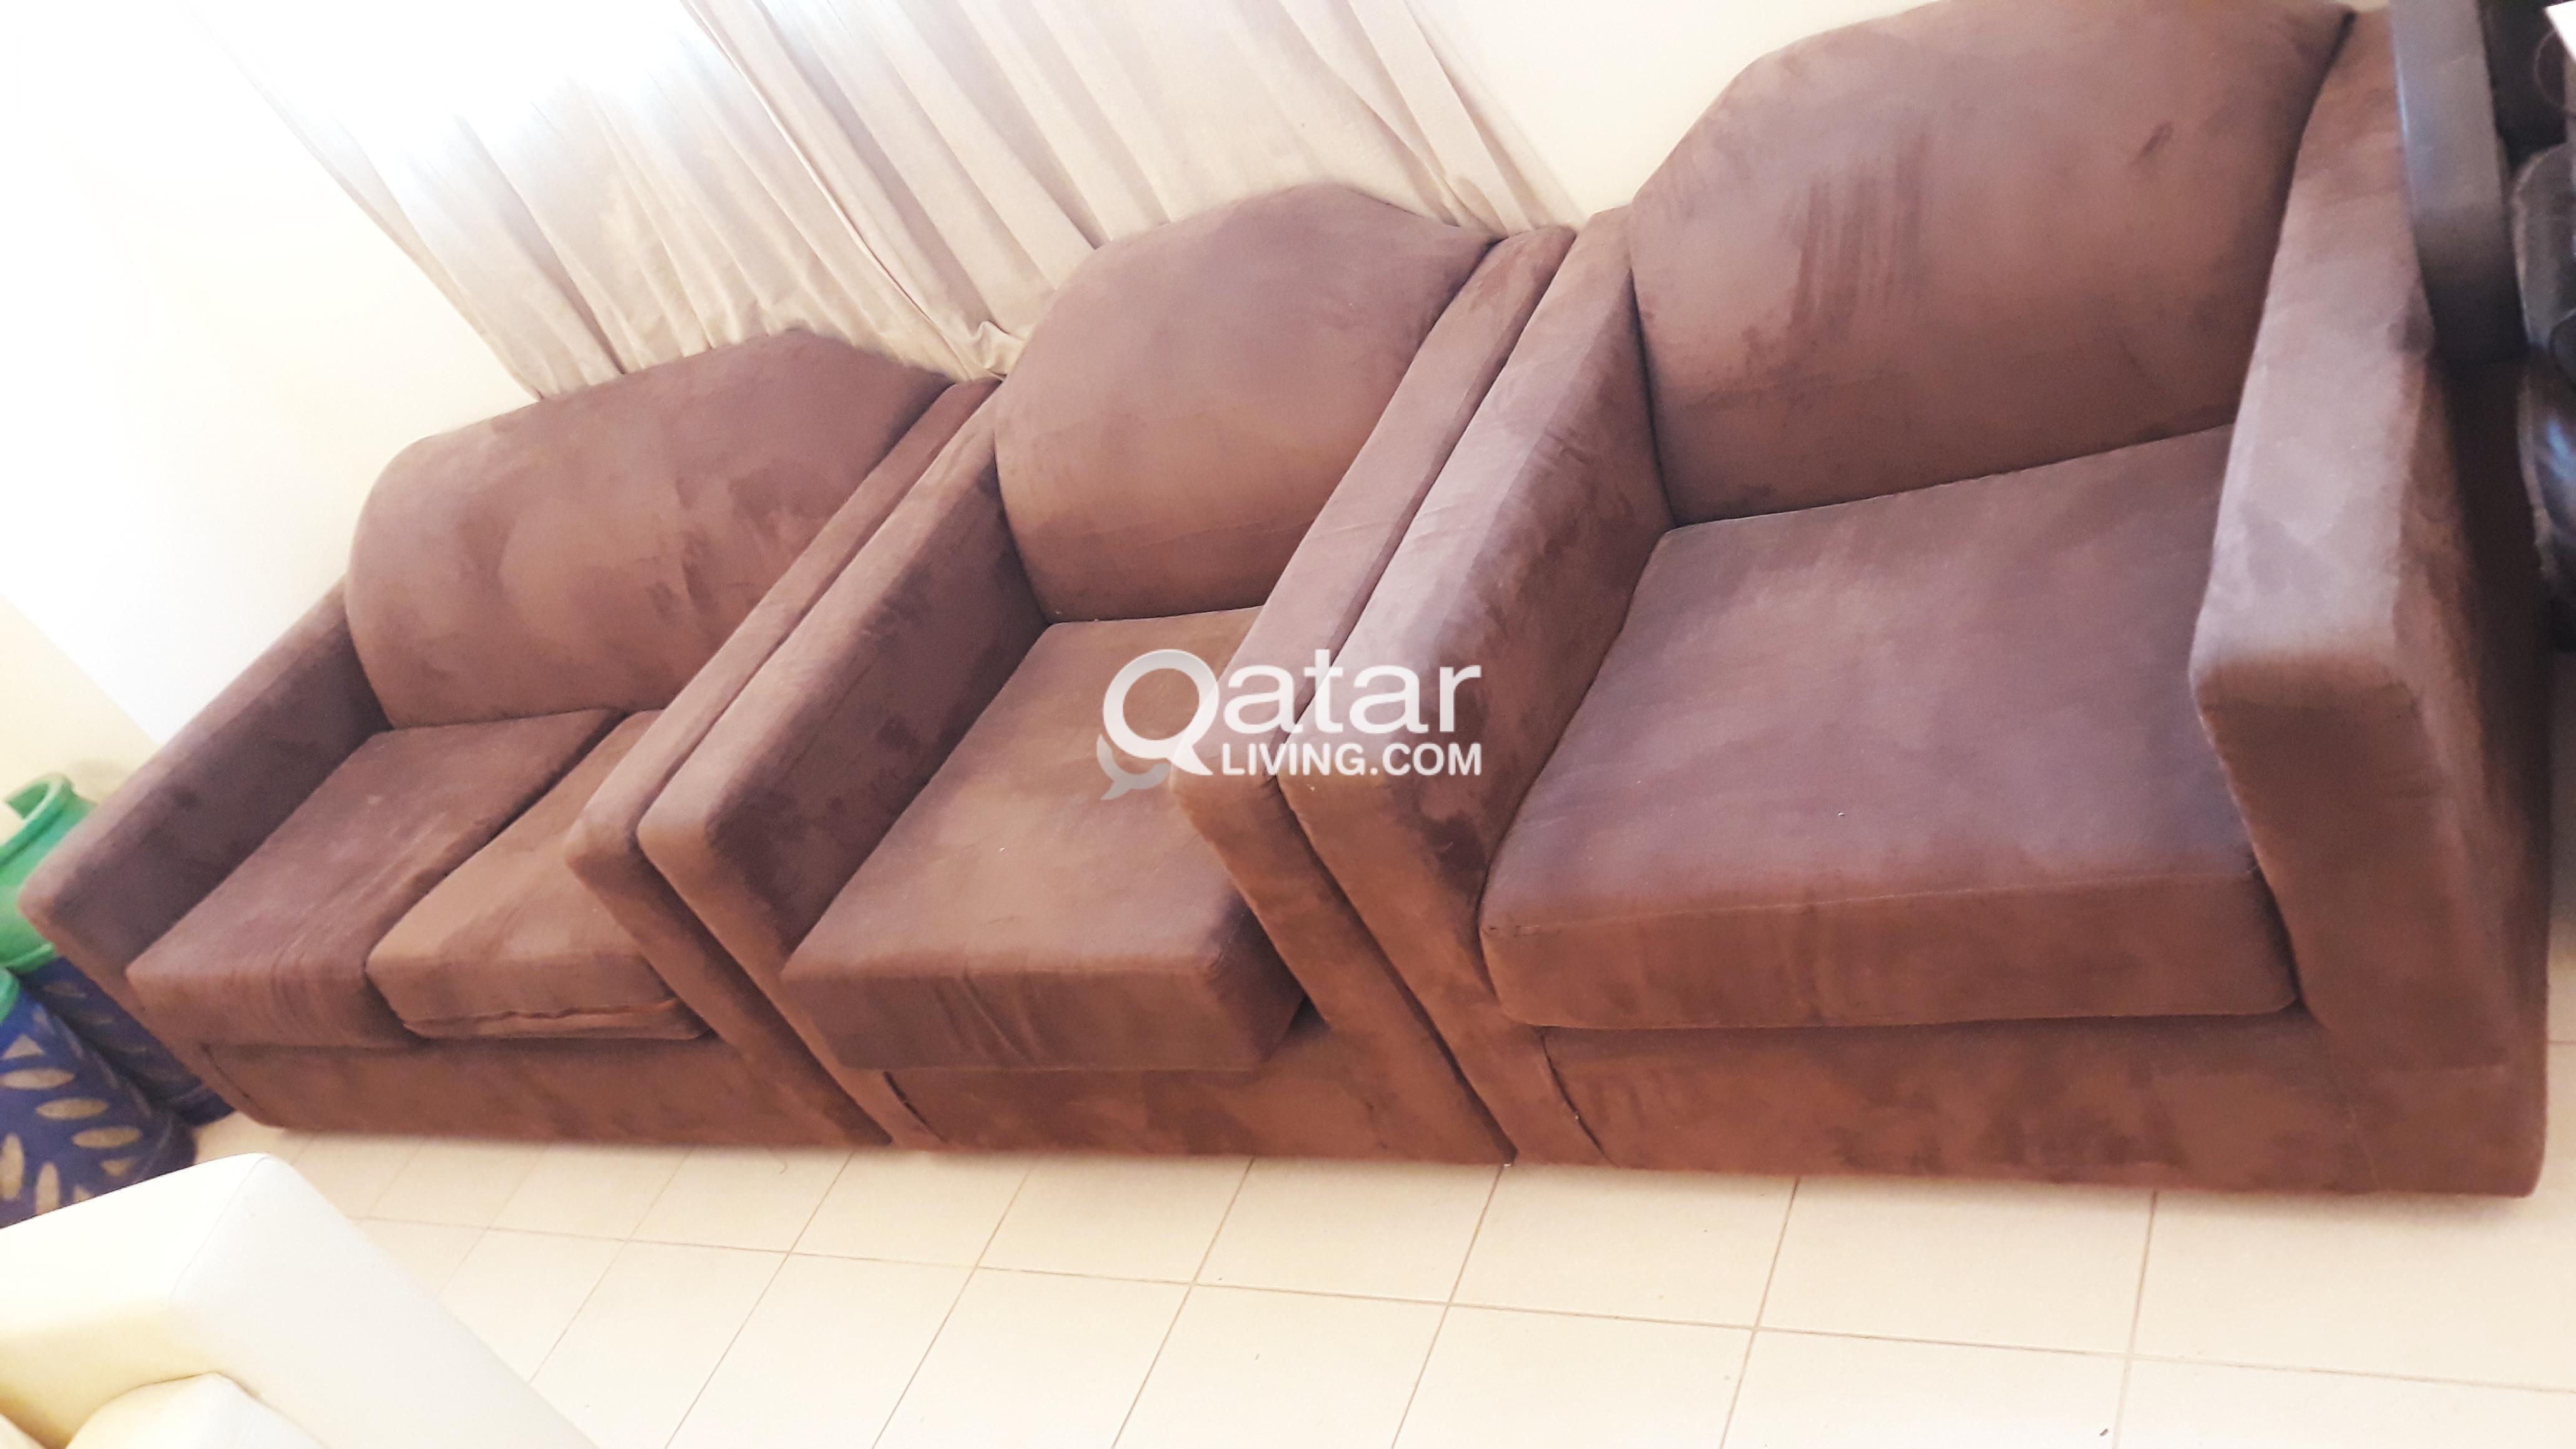 4 seater sofa for sale @ 400 QAR | Qatar Living